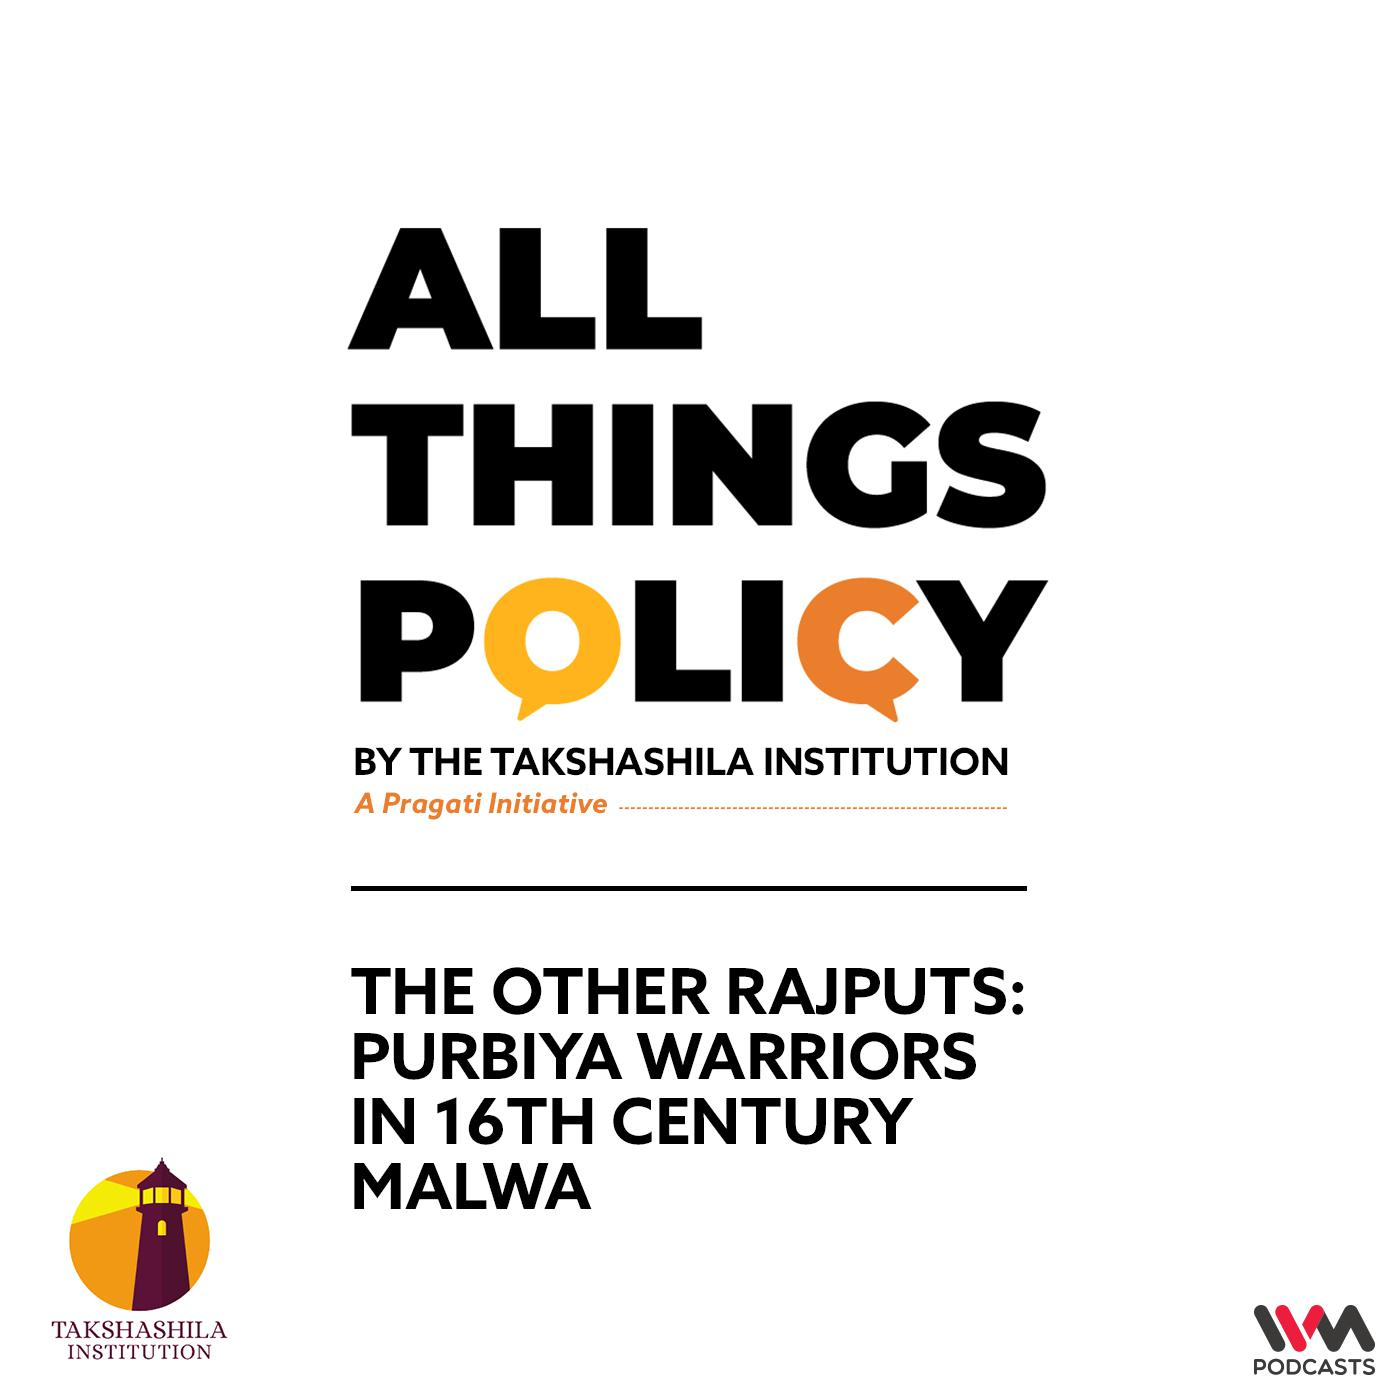 The Other Rajputs: Purbiya Warriors in 16th century Malwa